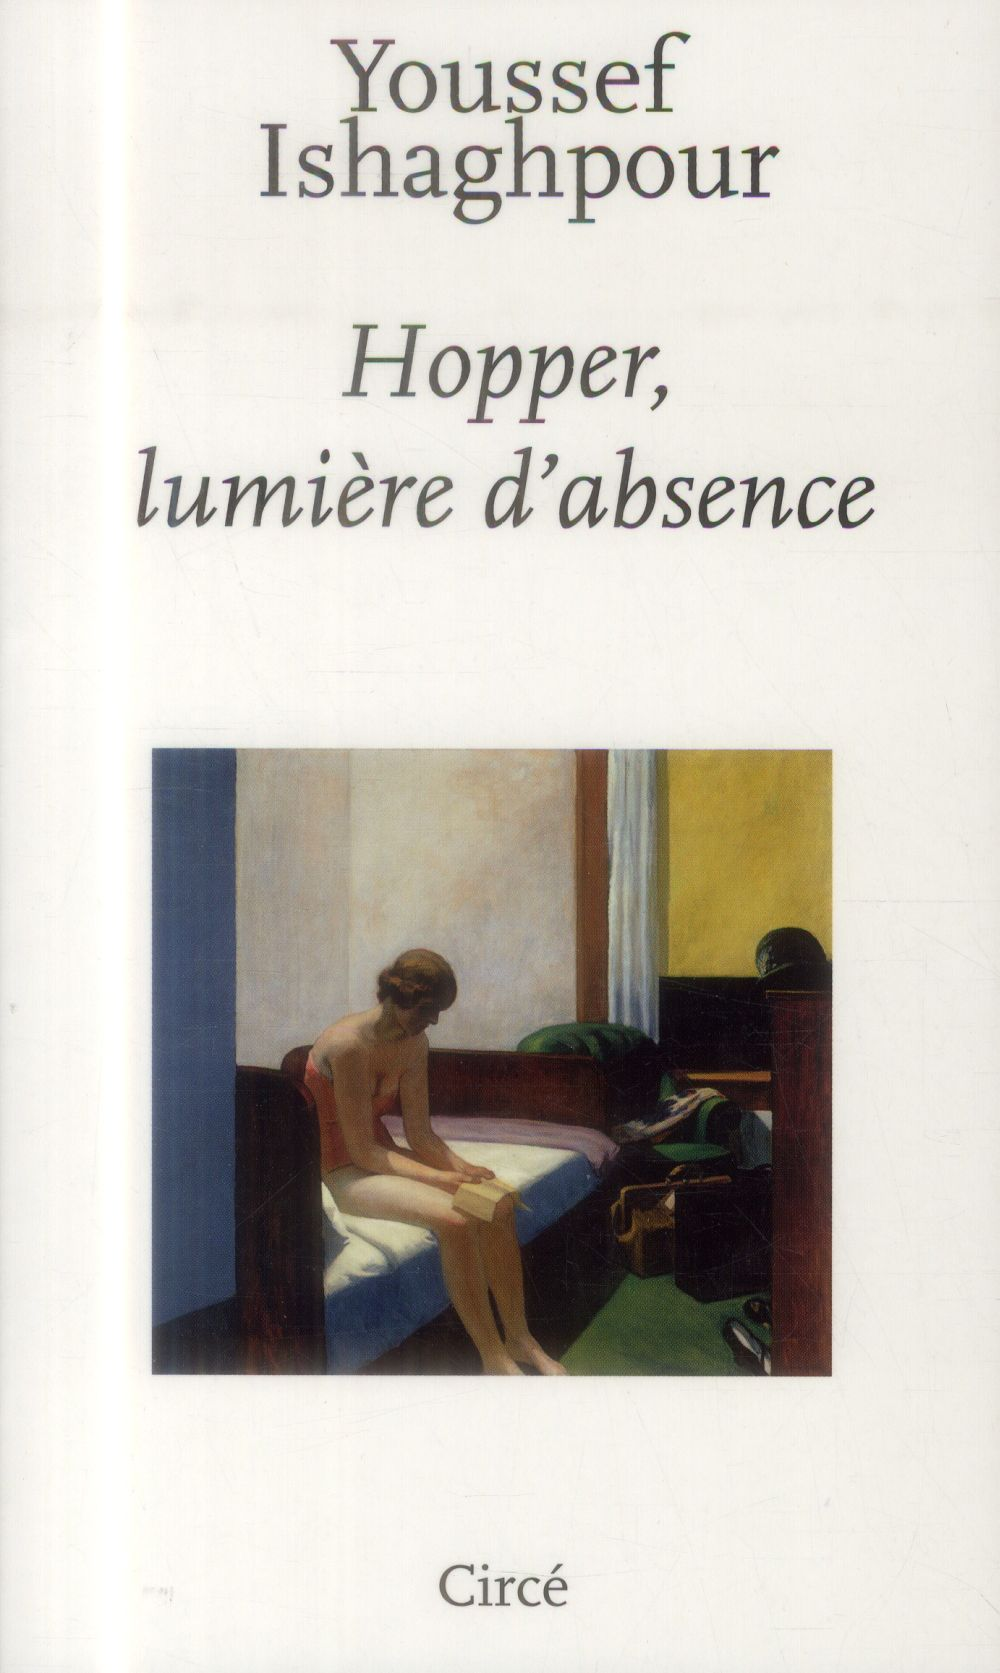 Hopper, lumière d'absence